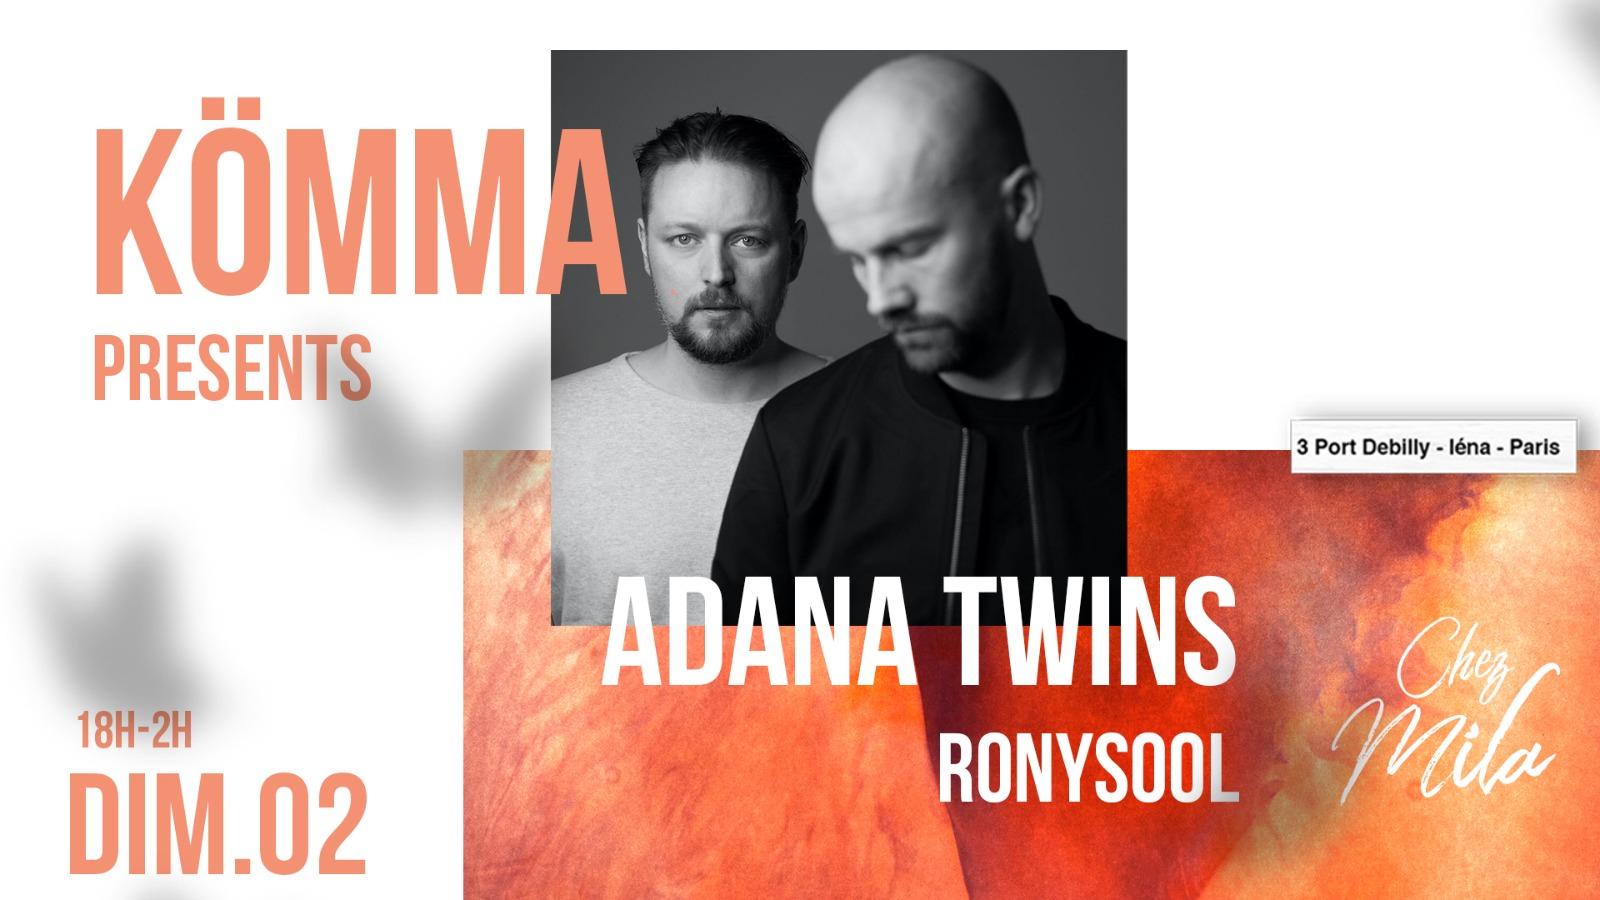 KÖMMA Paris x Chez Mila presents : Adana Twins (Diynamic)